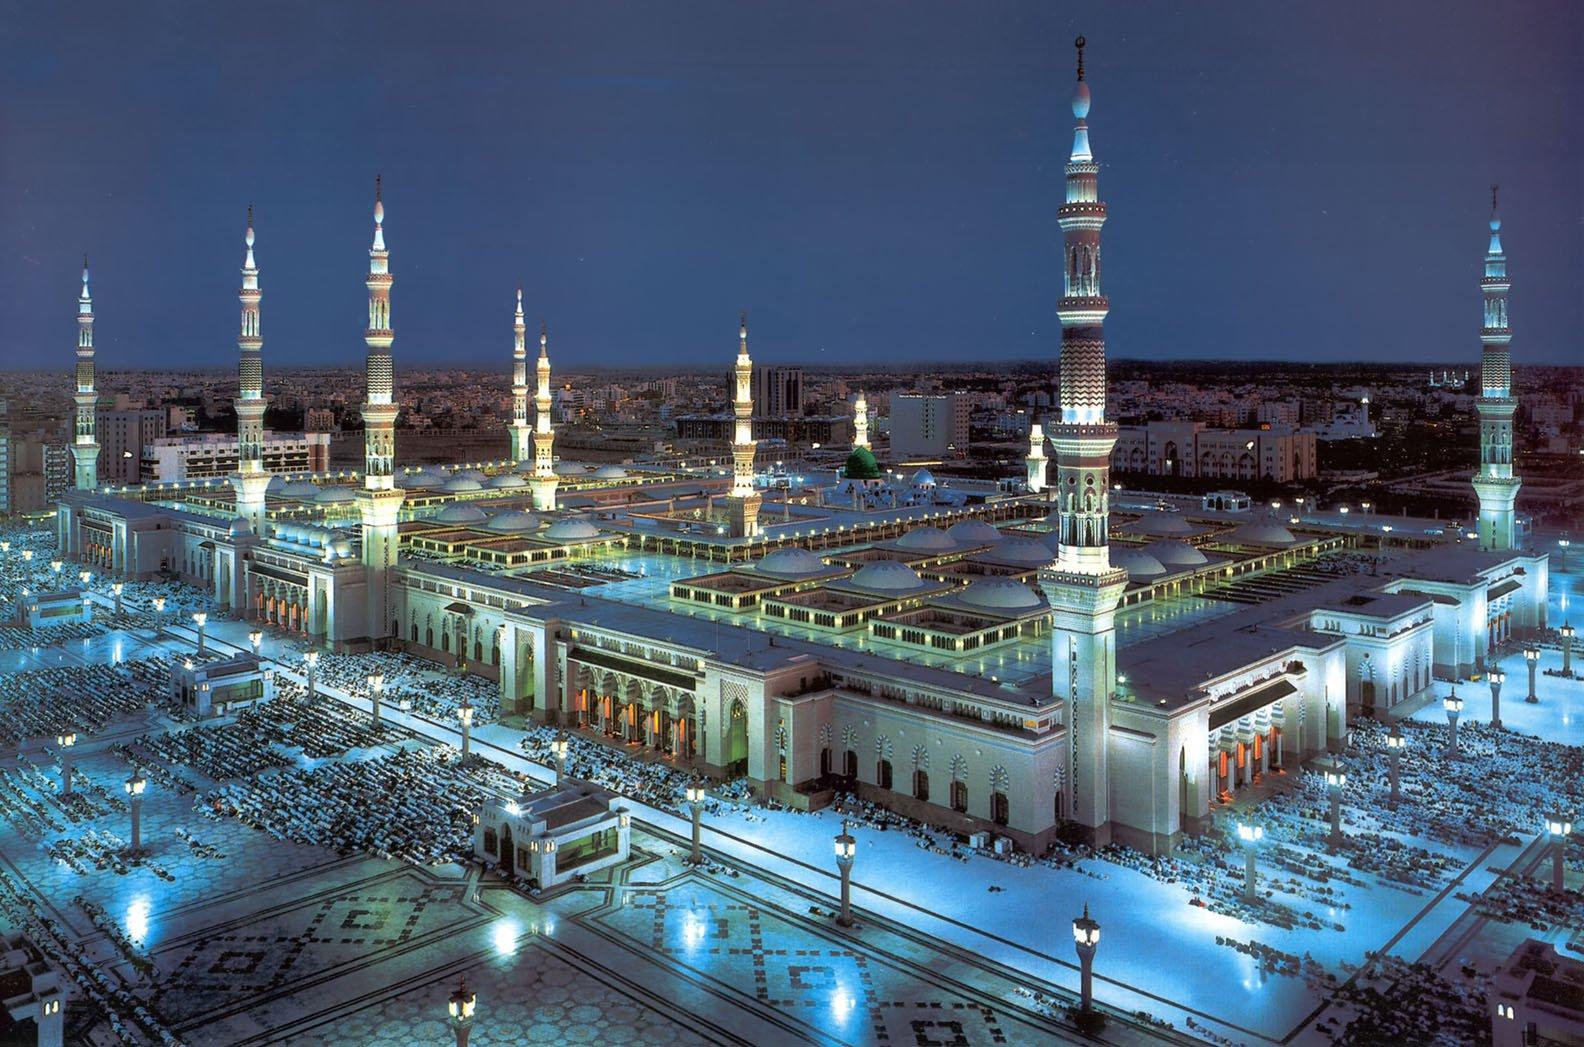 Madinah Al- Munawwarah